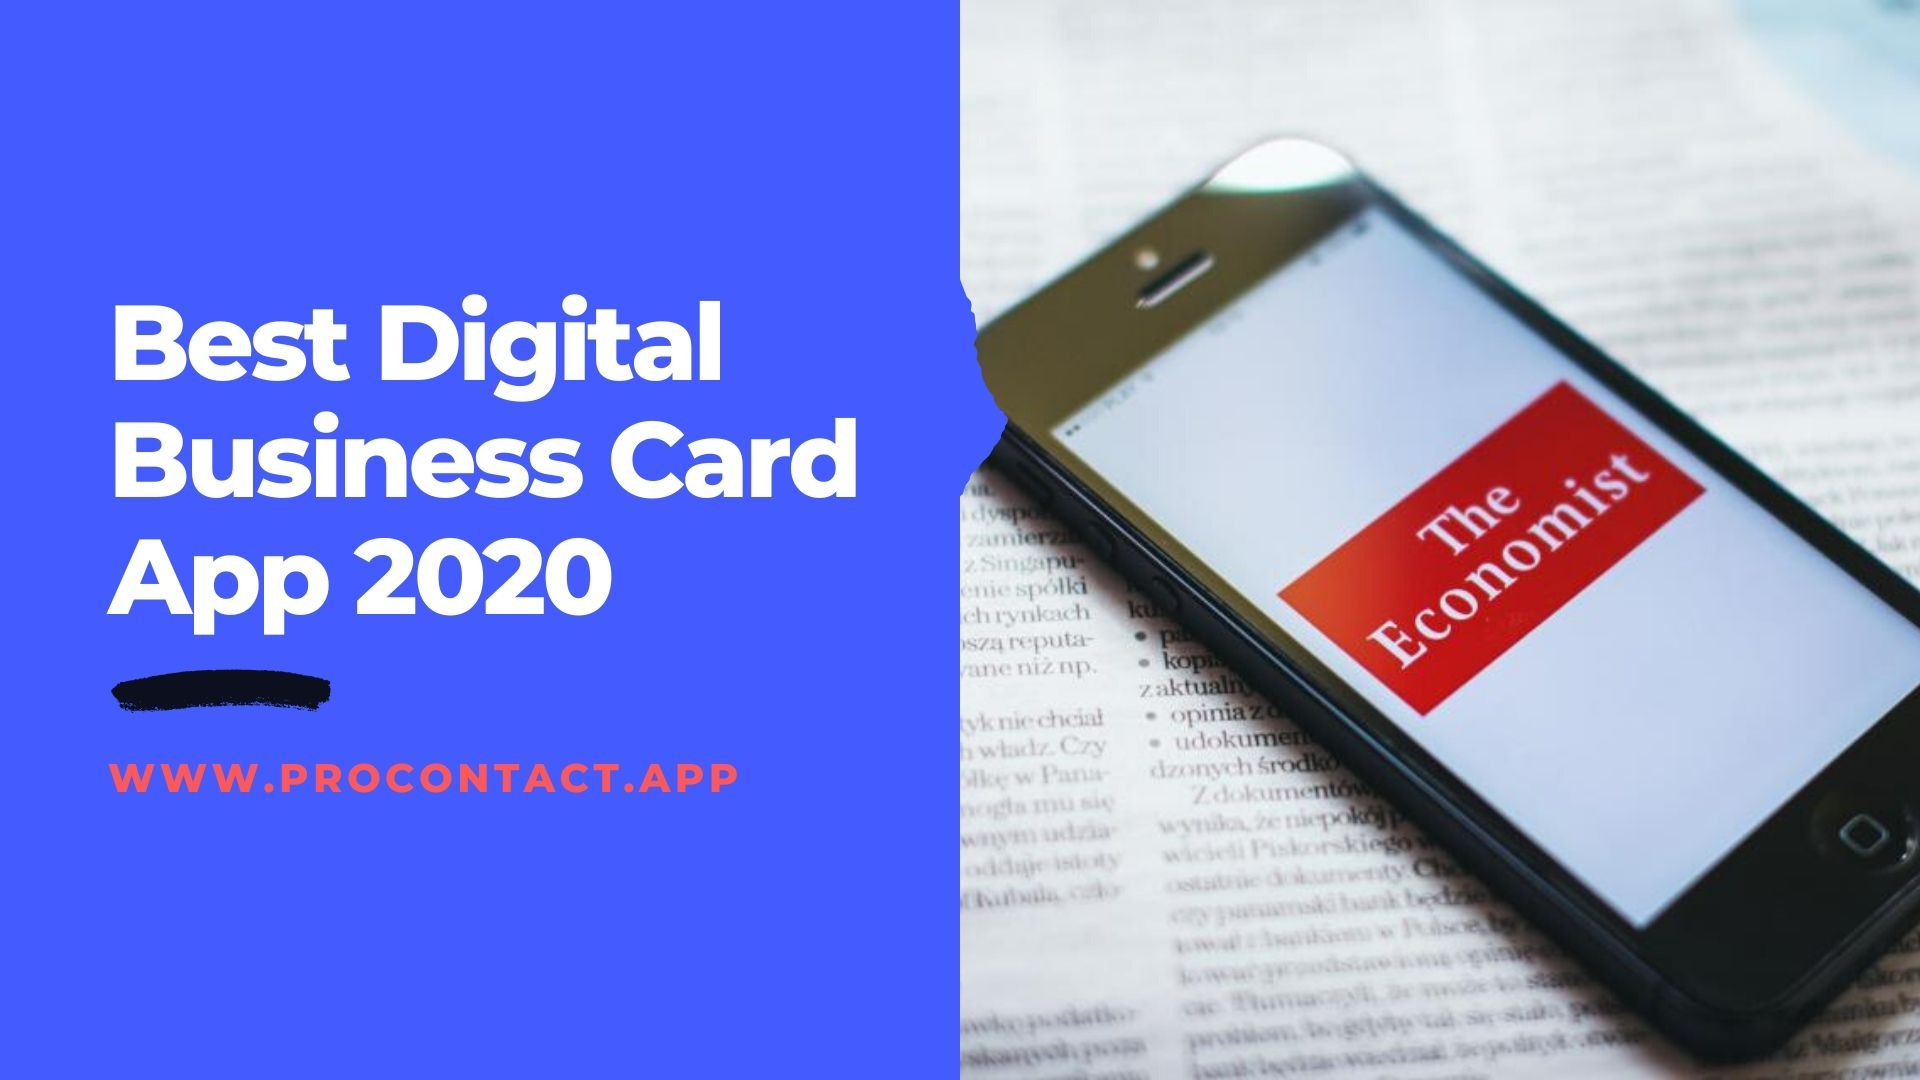 Best Digital Business Card App 2020 Procontact App Digital Business Card Business Card App Digital Business